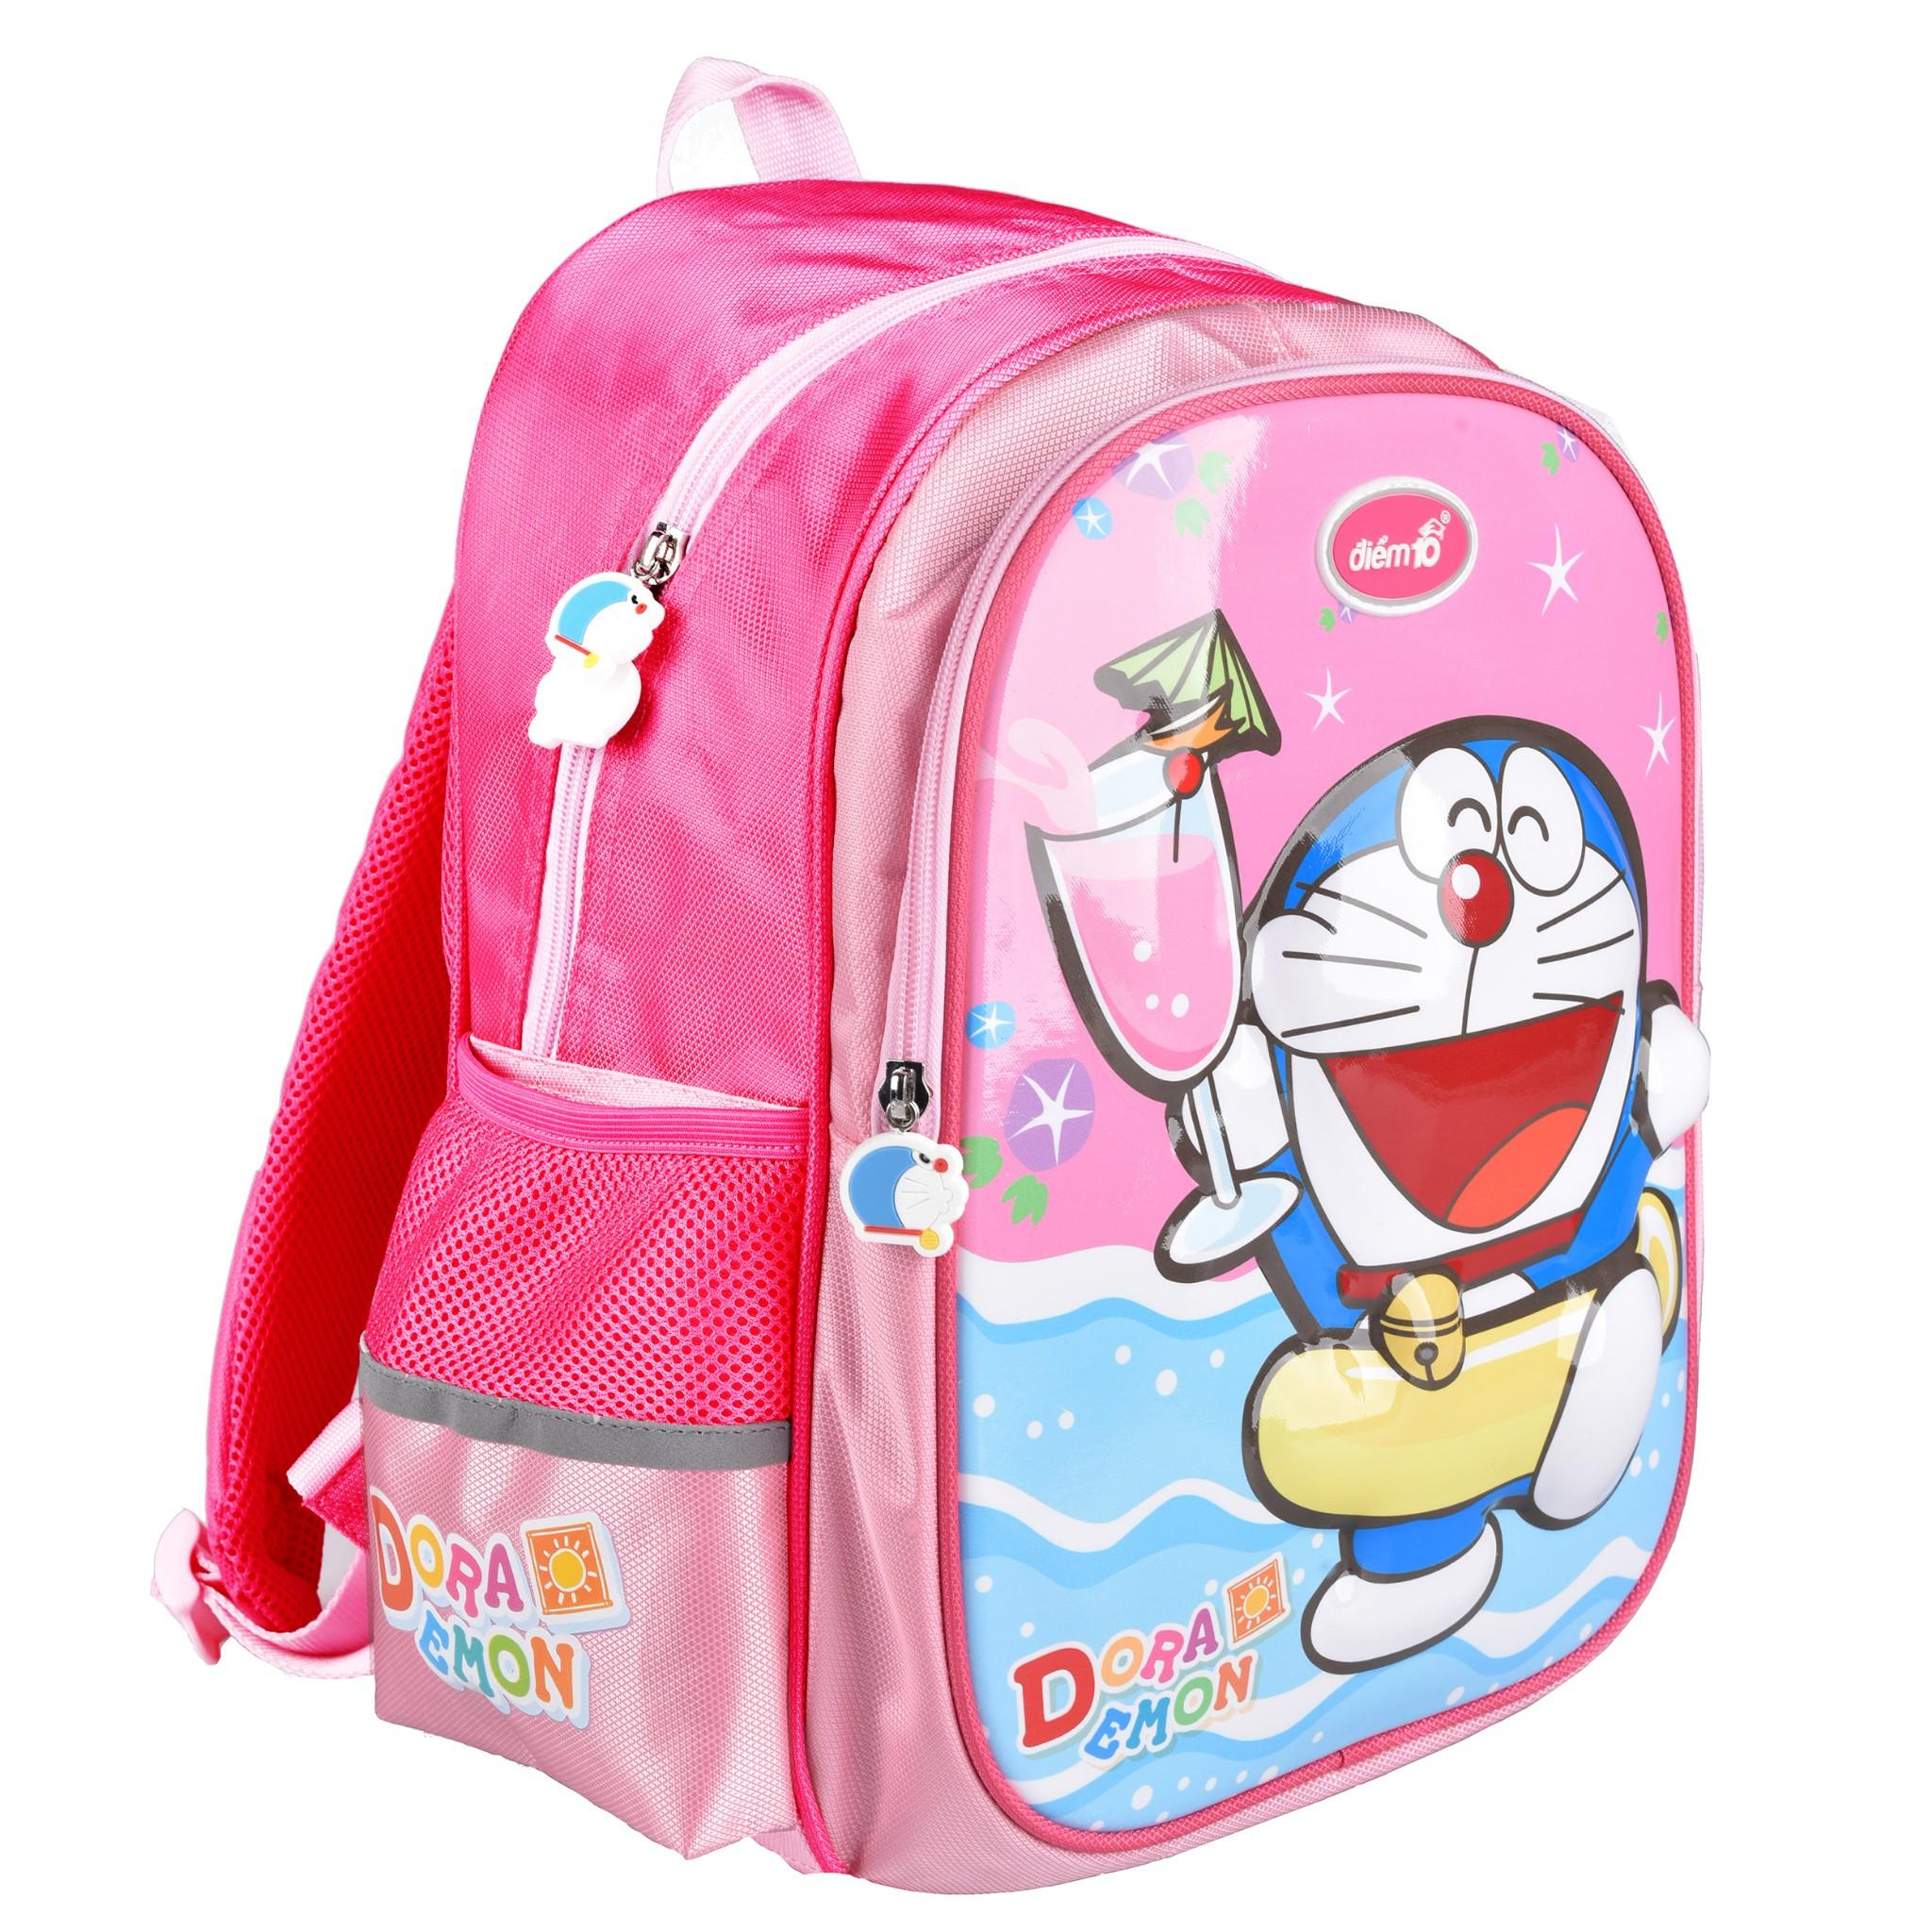 Ba lô học sinh Điểm 10 Doraemon TP-BP06/DO Phiên bản 2019